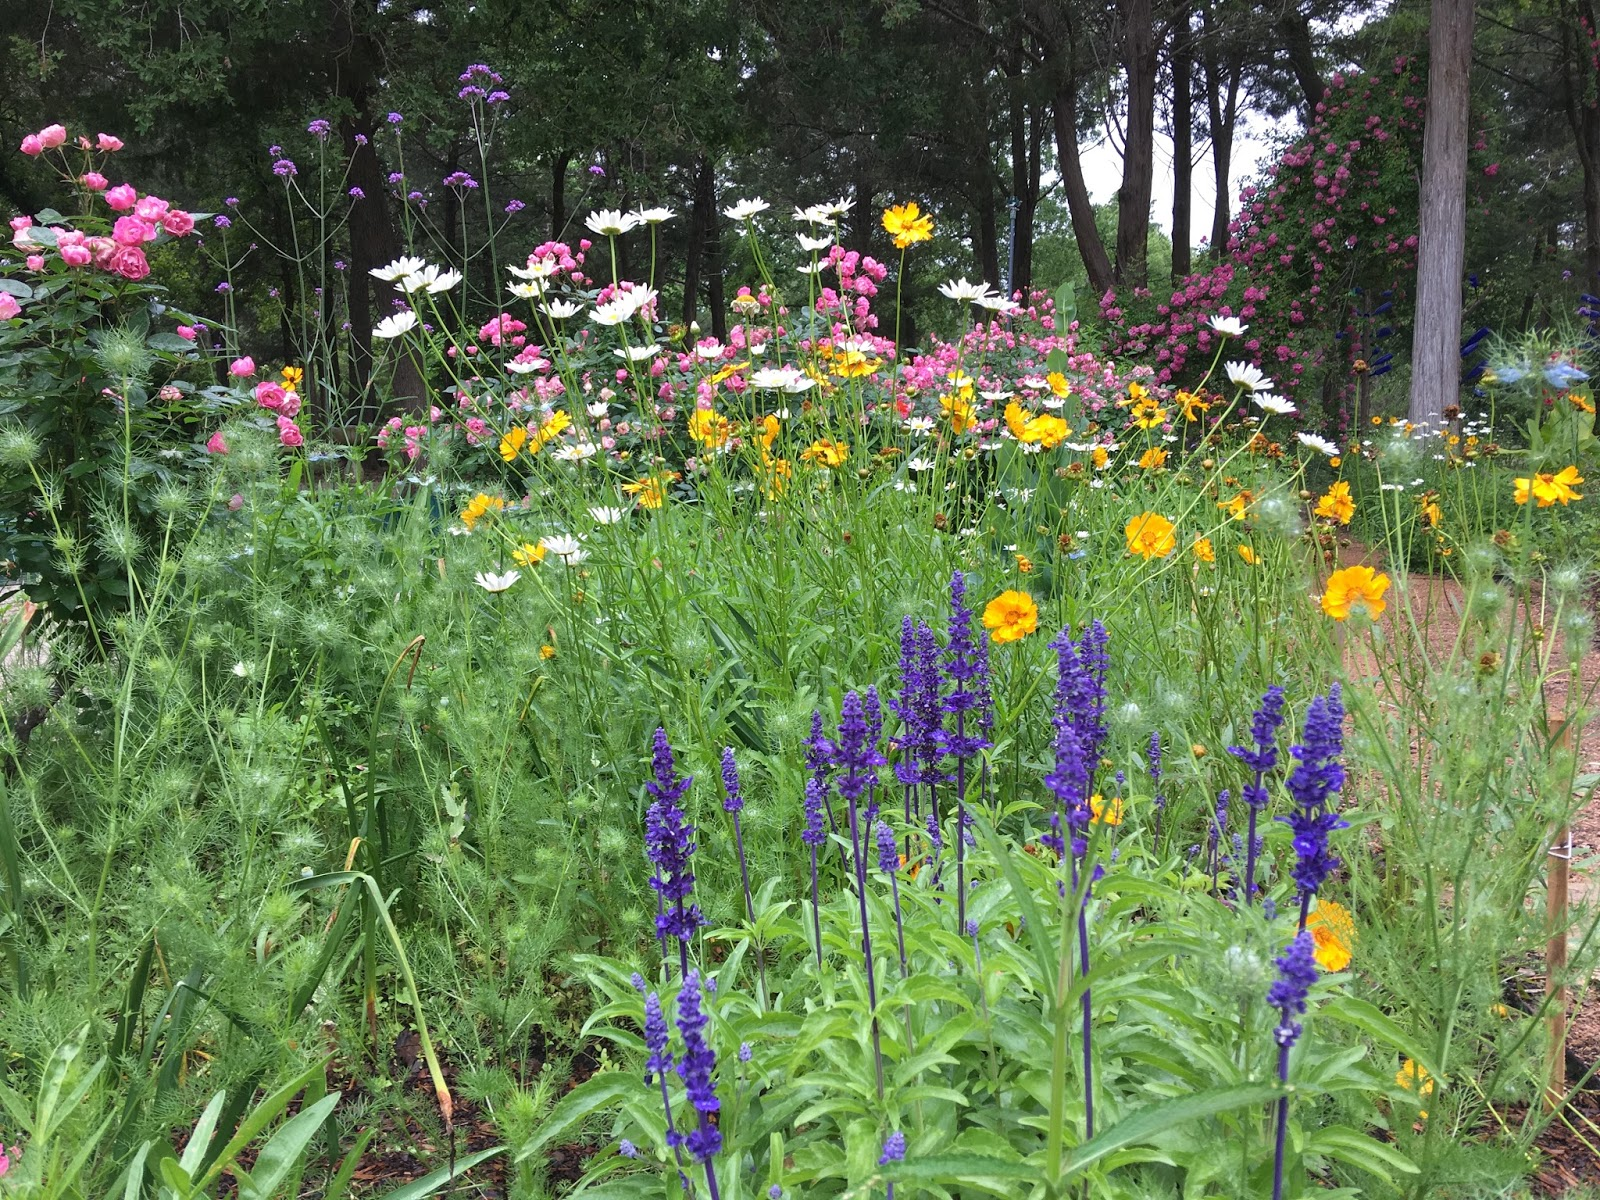 Lisa bonassins garden some pretty flowers in my garden april 22 2018 some pretty flowers in my garden april 22 2018 mightylinksfo